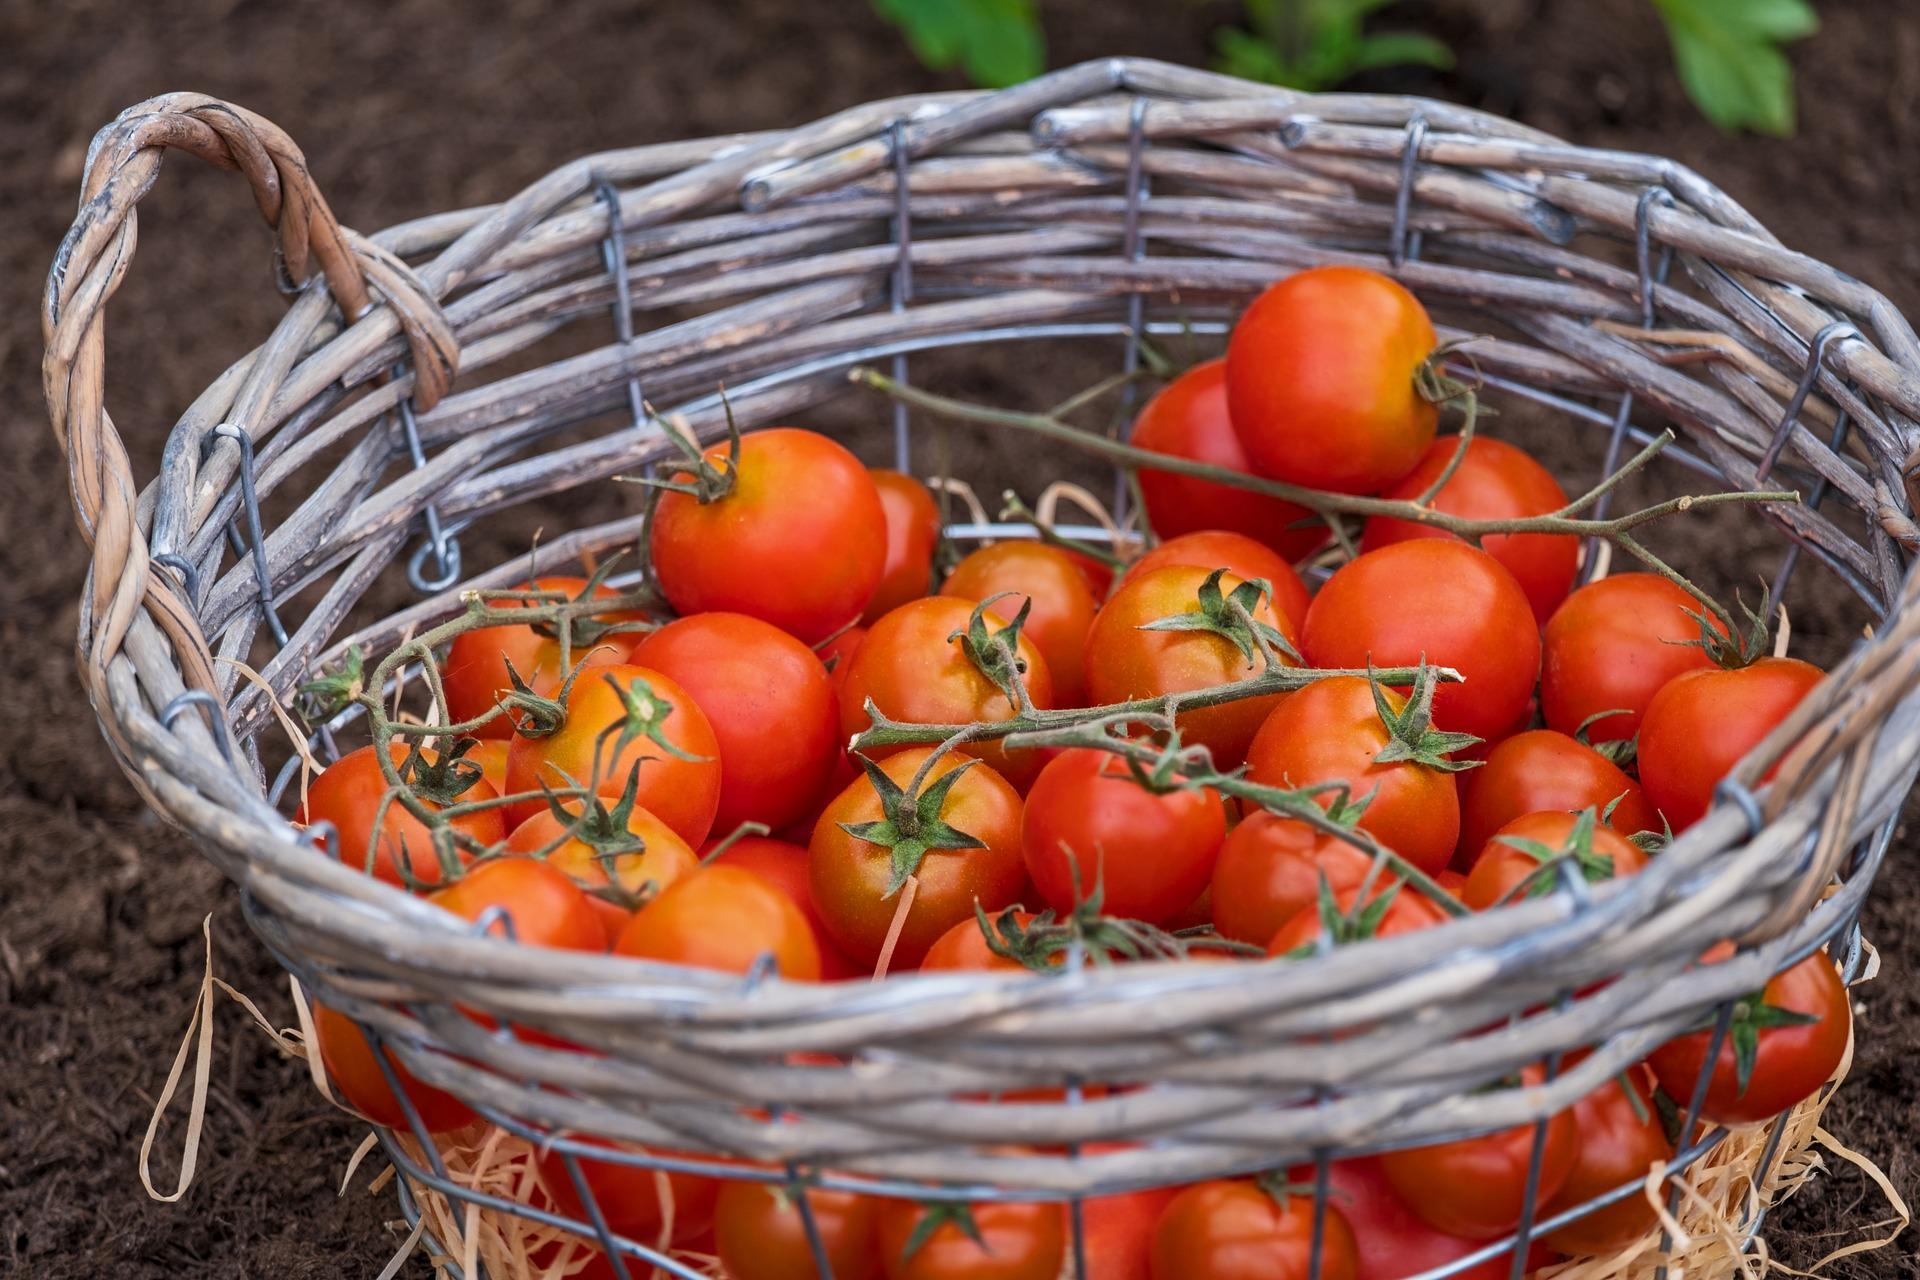 tomatoes-4180020_1920 (1).jpg